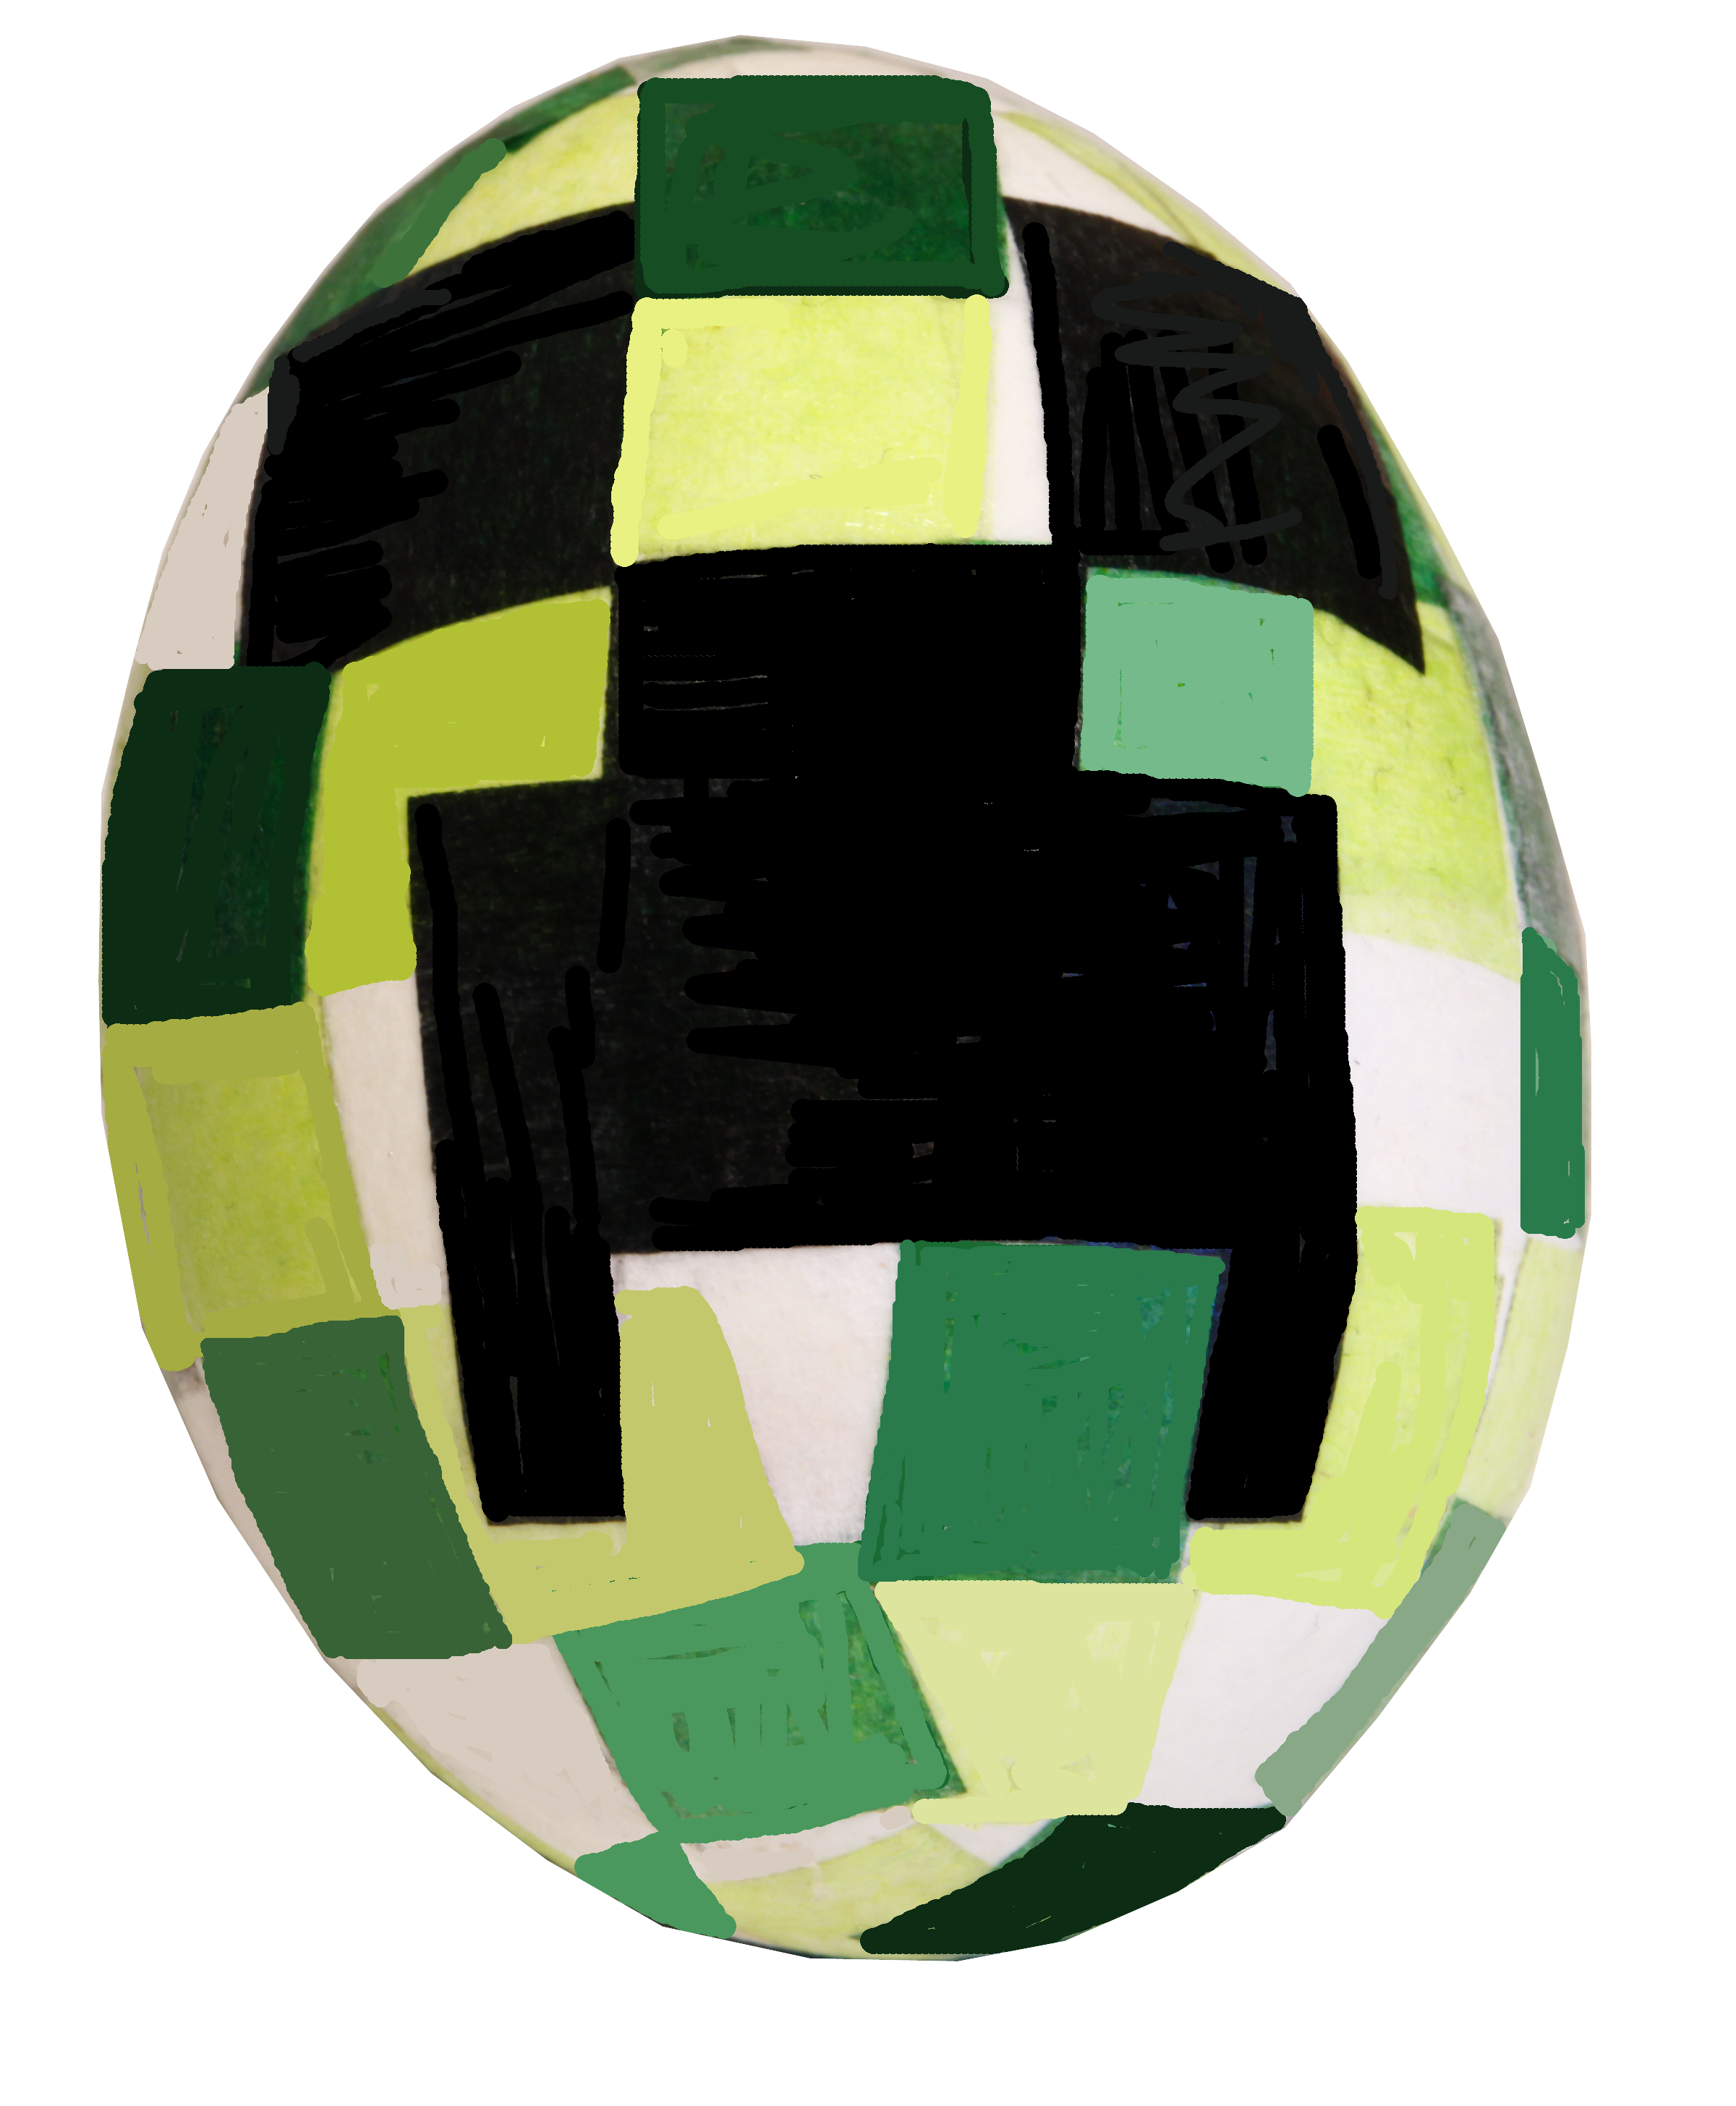 Minecraft Creeper Easter Eggs